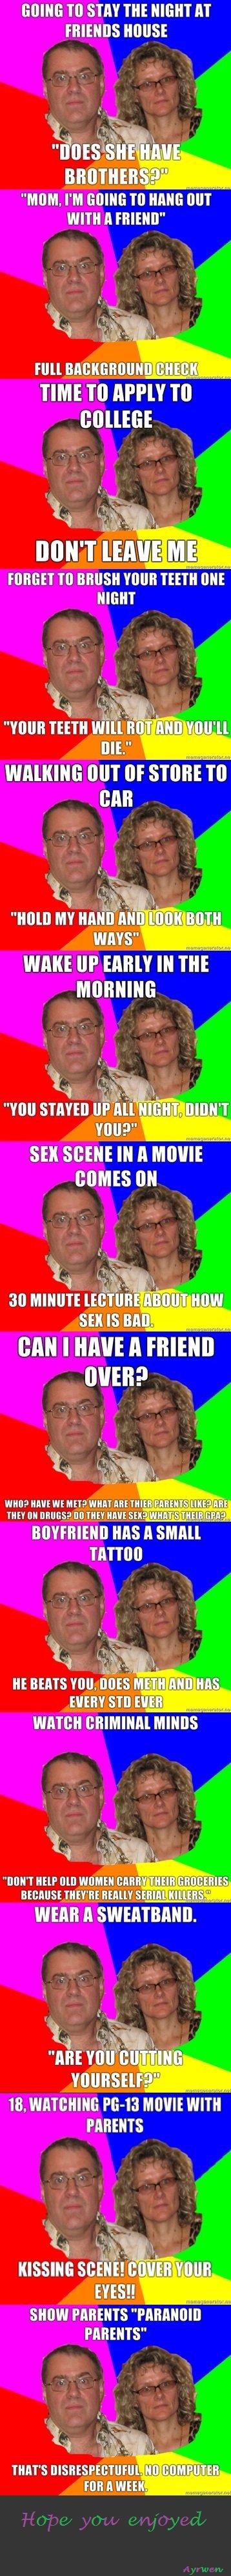 Paranoid Parents Comp 3. Part 1:funnyjunk.com/funny_pictures/2032669/Paranoid+Parents+Comp/ Part 2:funnyjunk.com/funny_pictures/2036170/Paranoid+Parents+Comp+2/